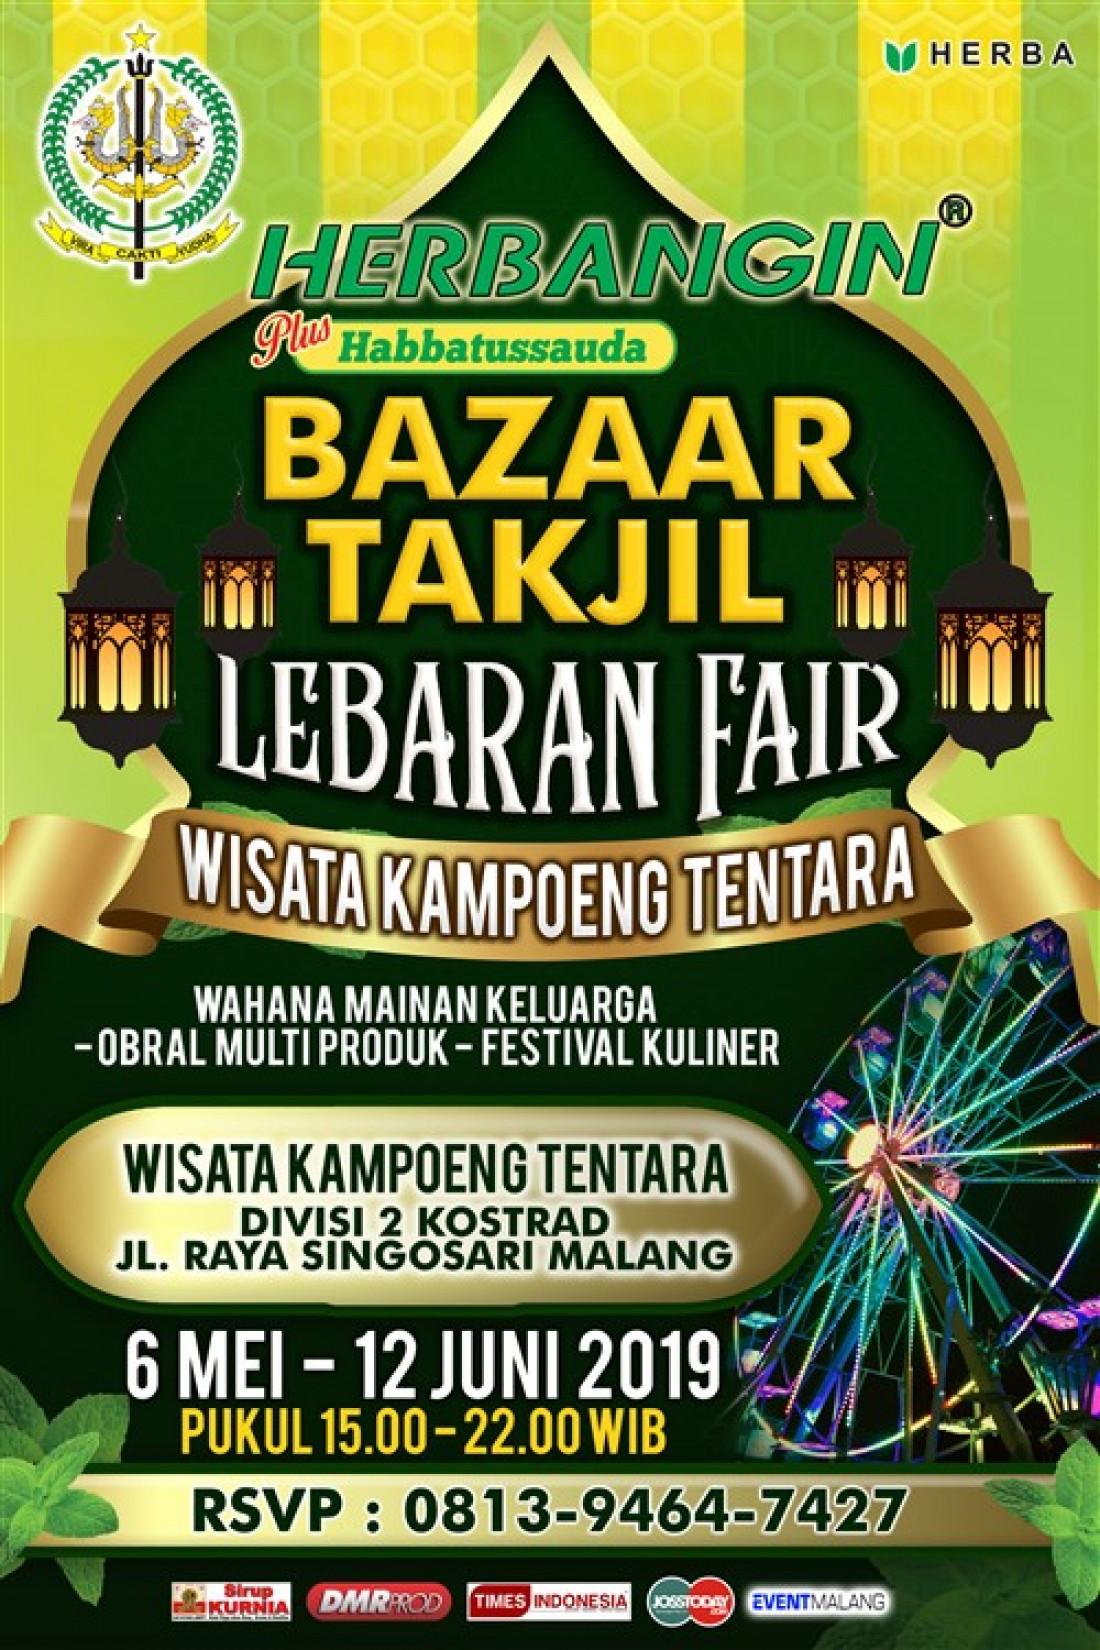 Bazaar Takjil Lebaran Fair